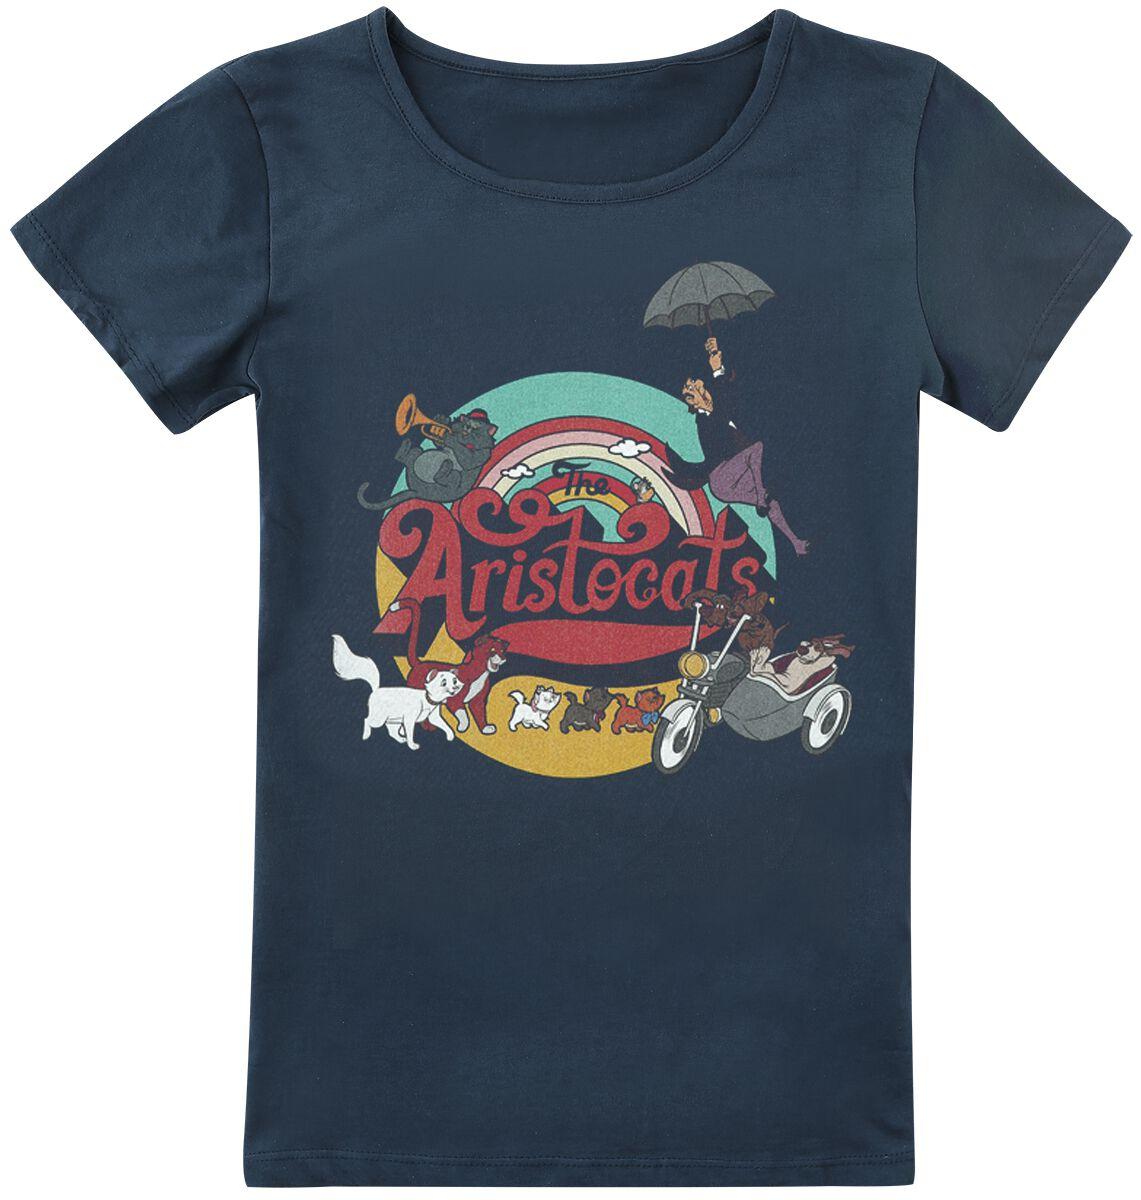 Aristocats The Aristocats T-Shirt navy WODARISTS014